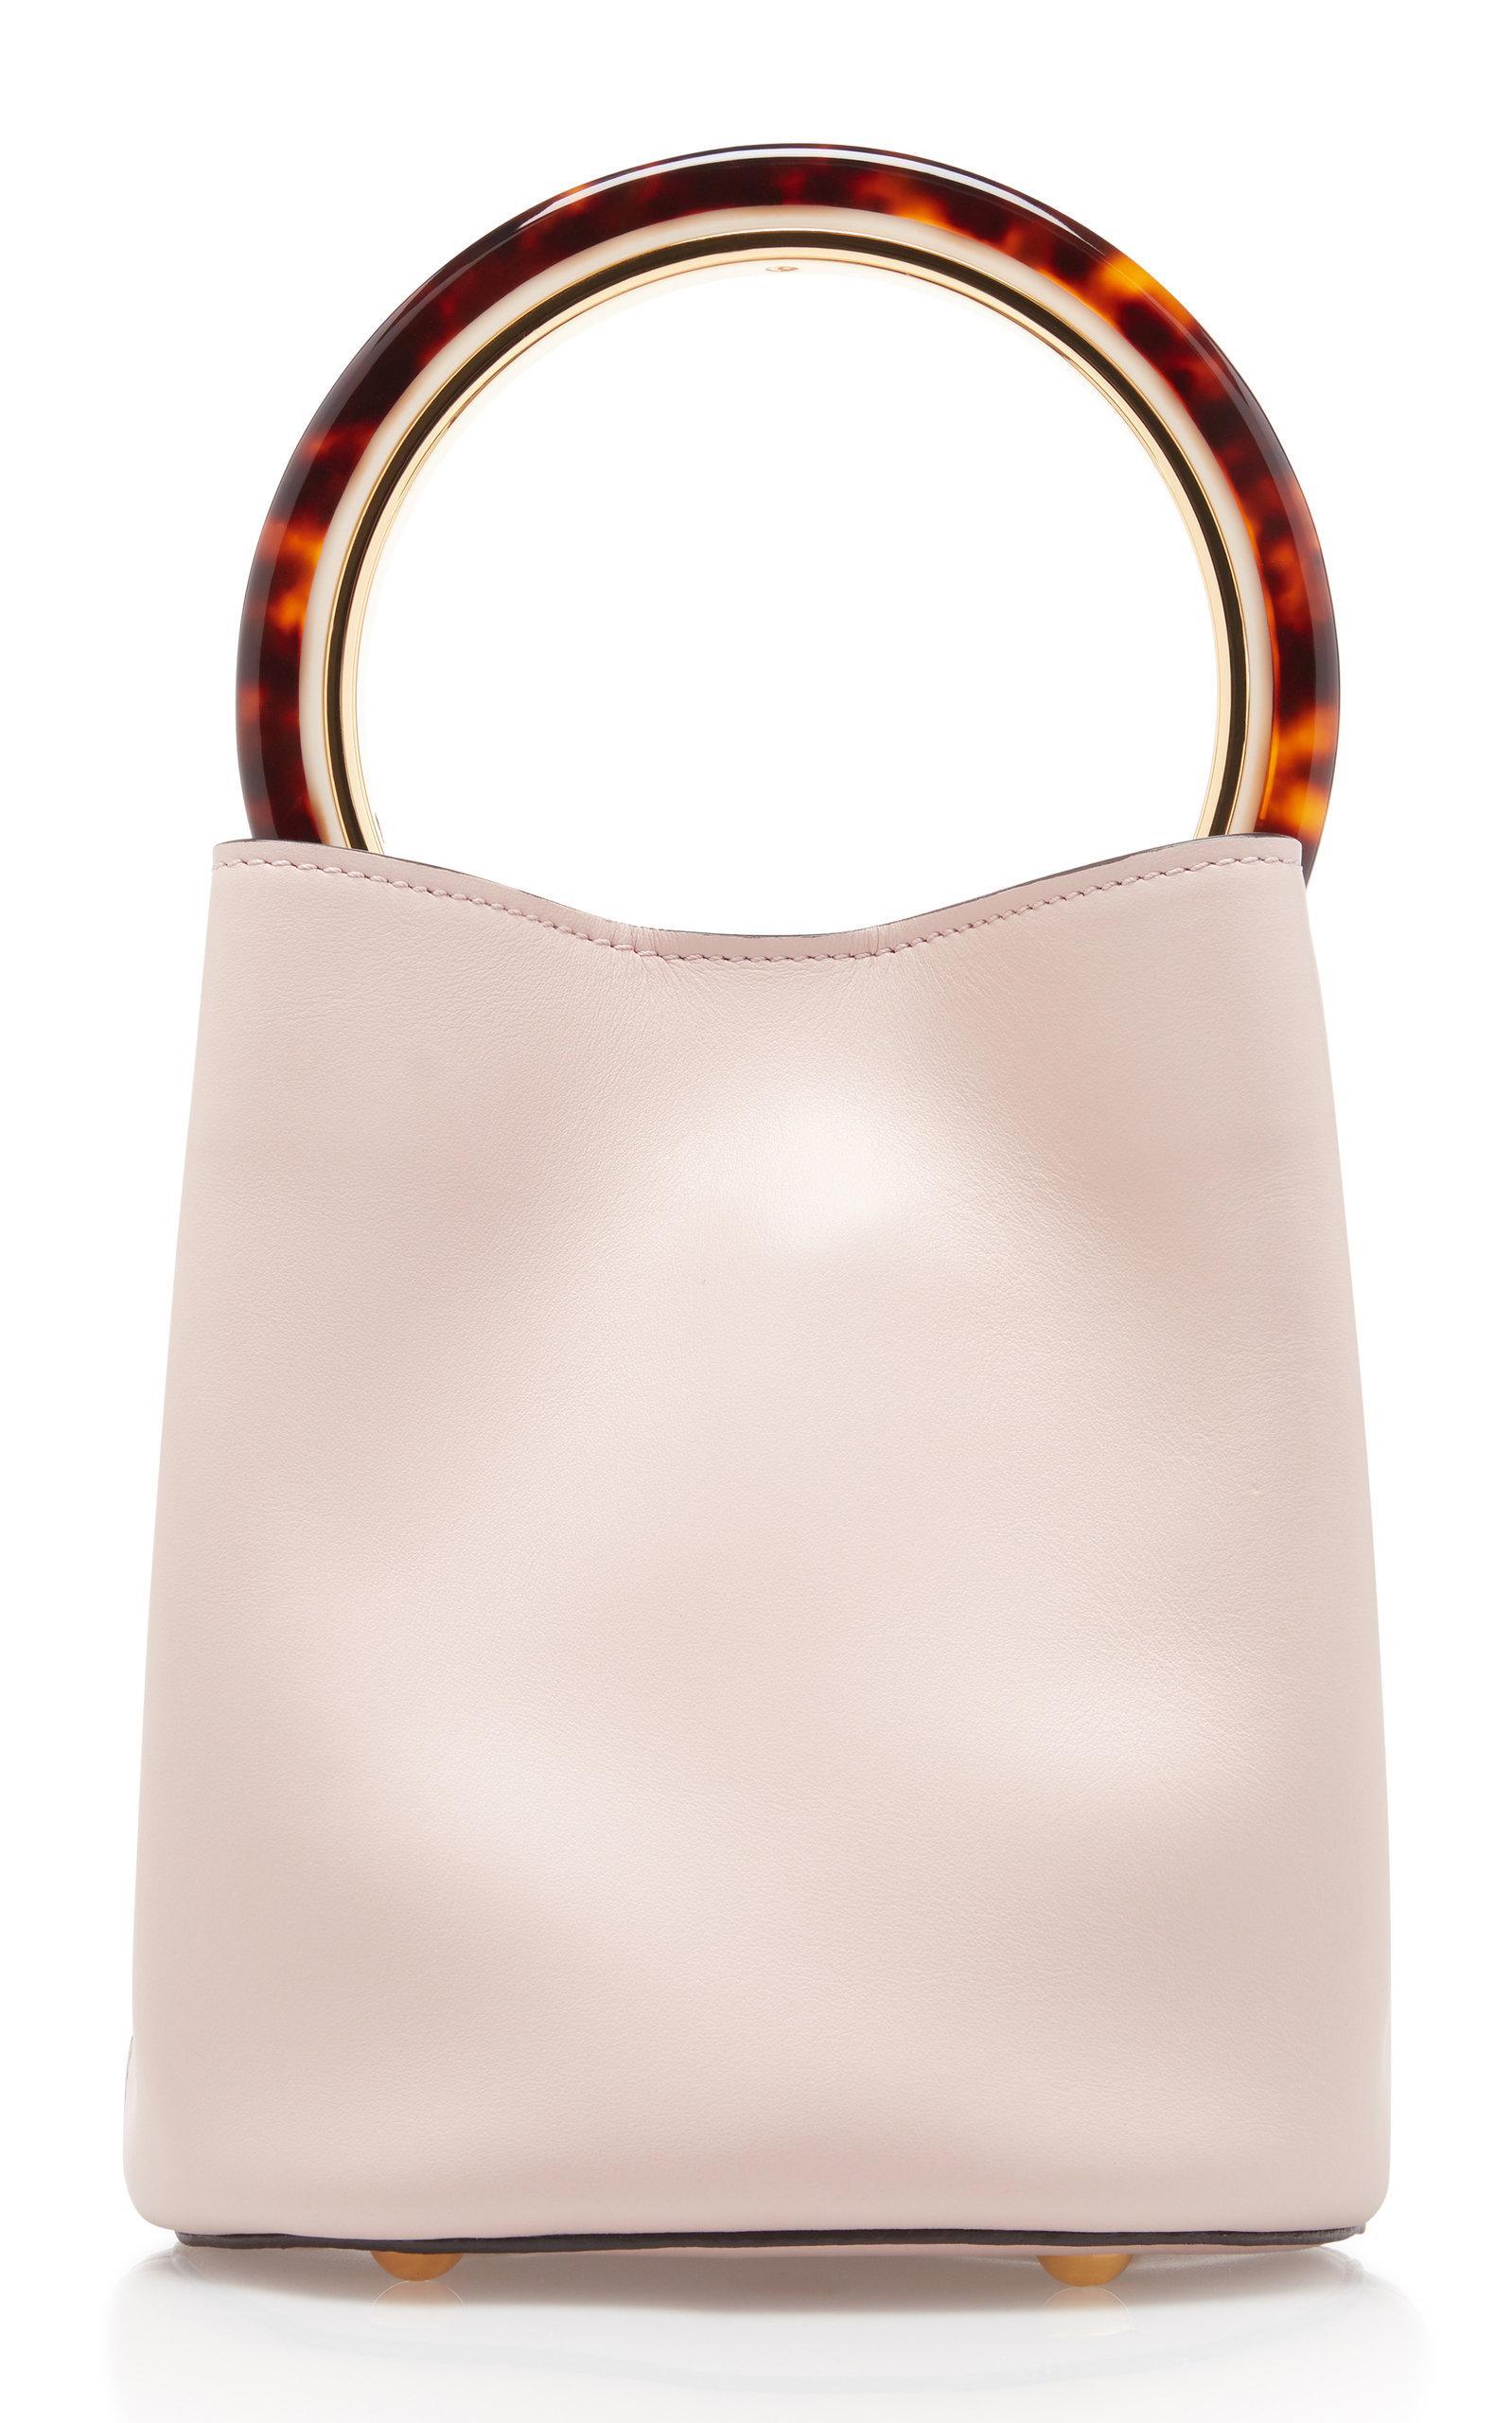 ca7b30e41285 Marni Pannier Bucket Bag With Tortoise Shell Handle - Lyst